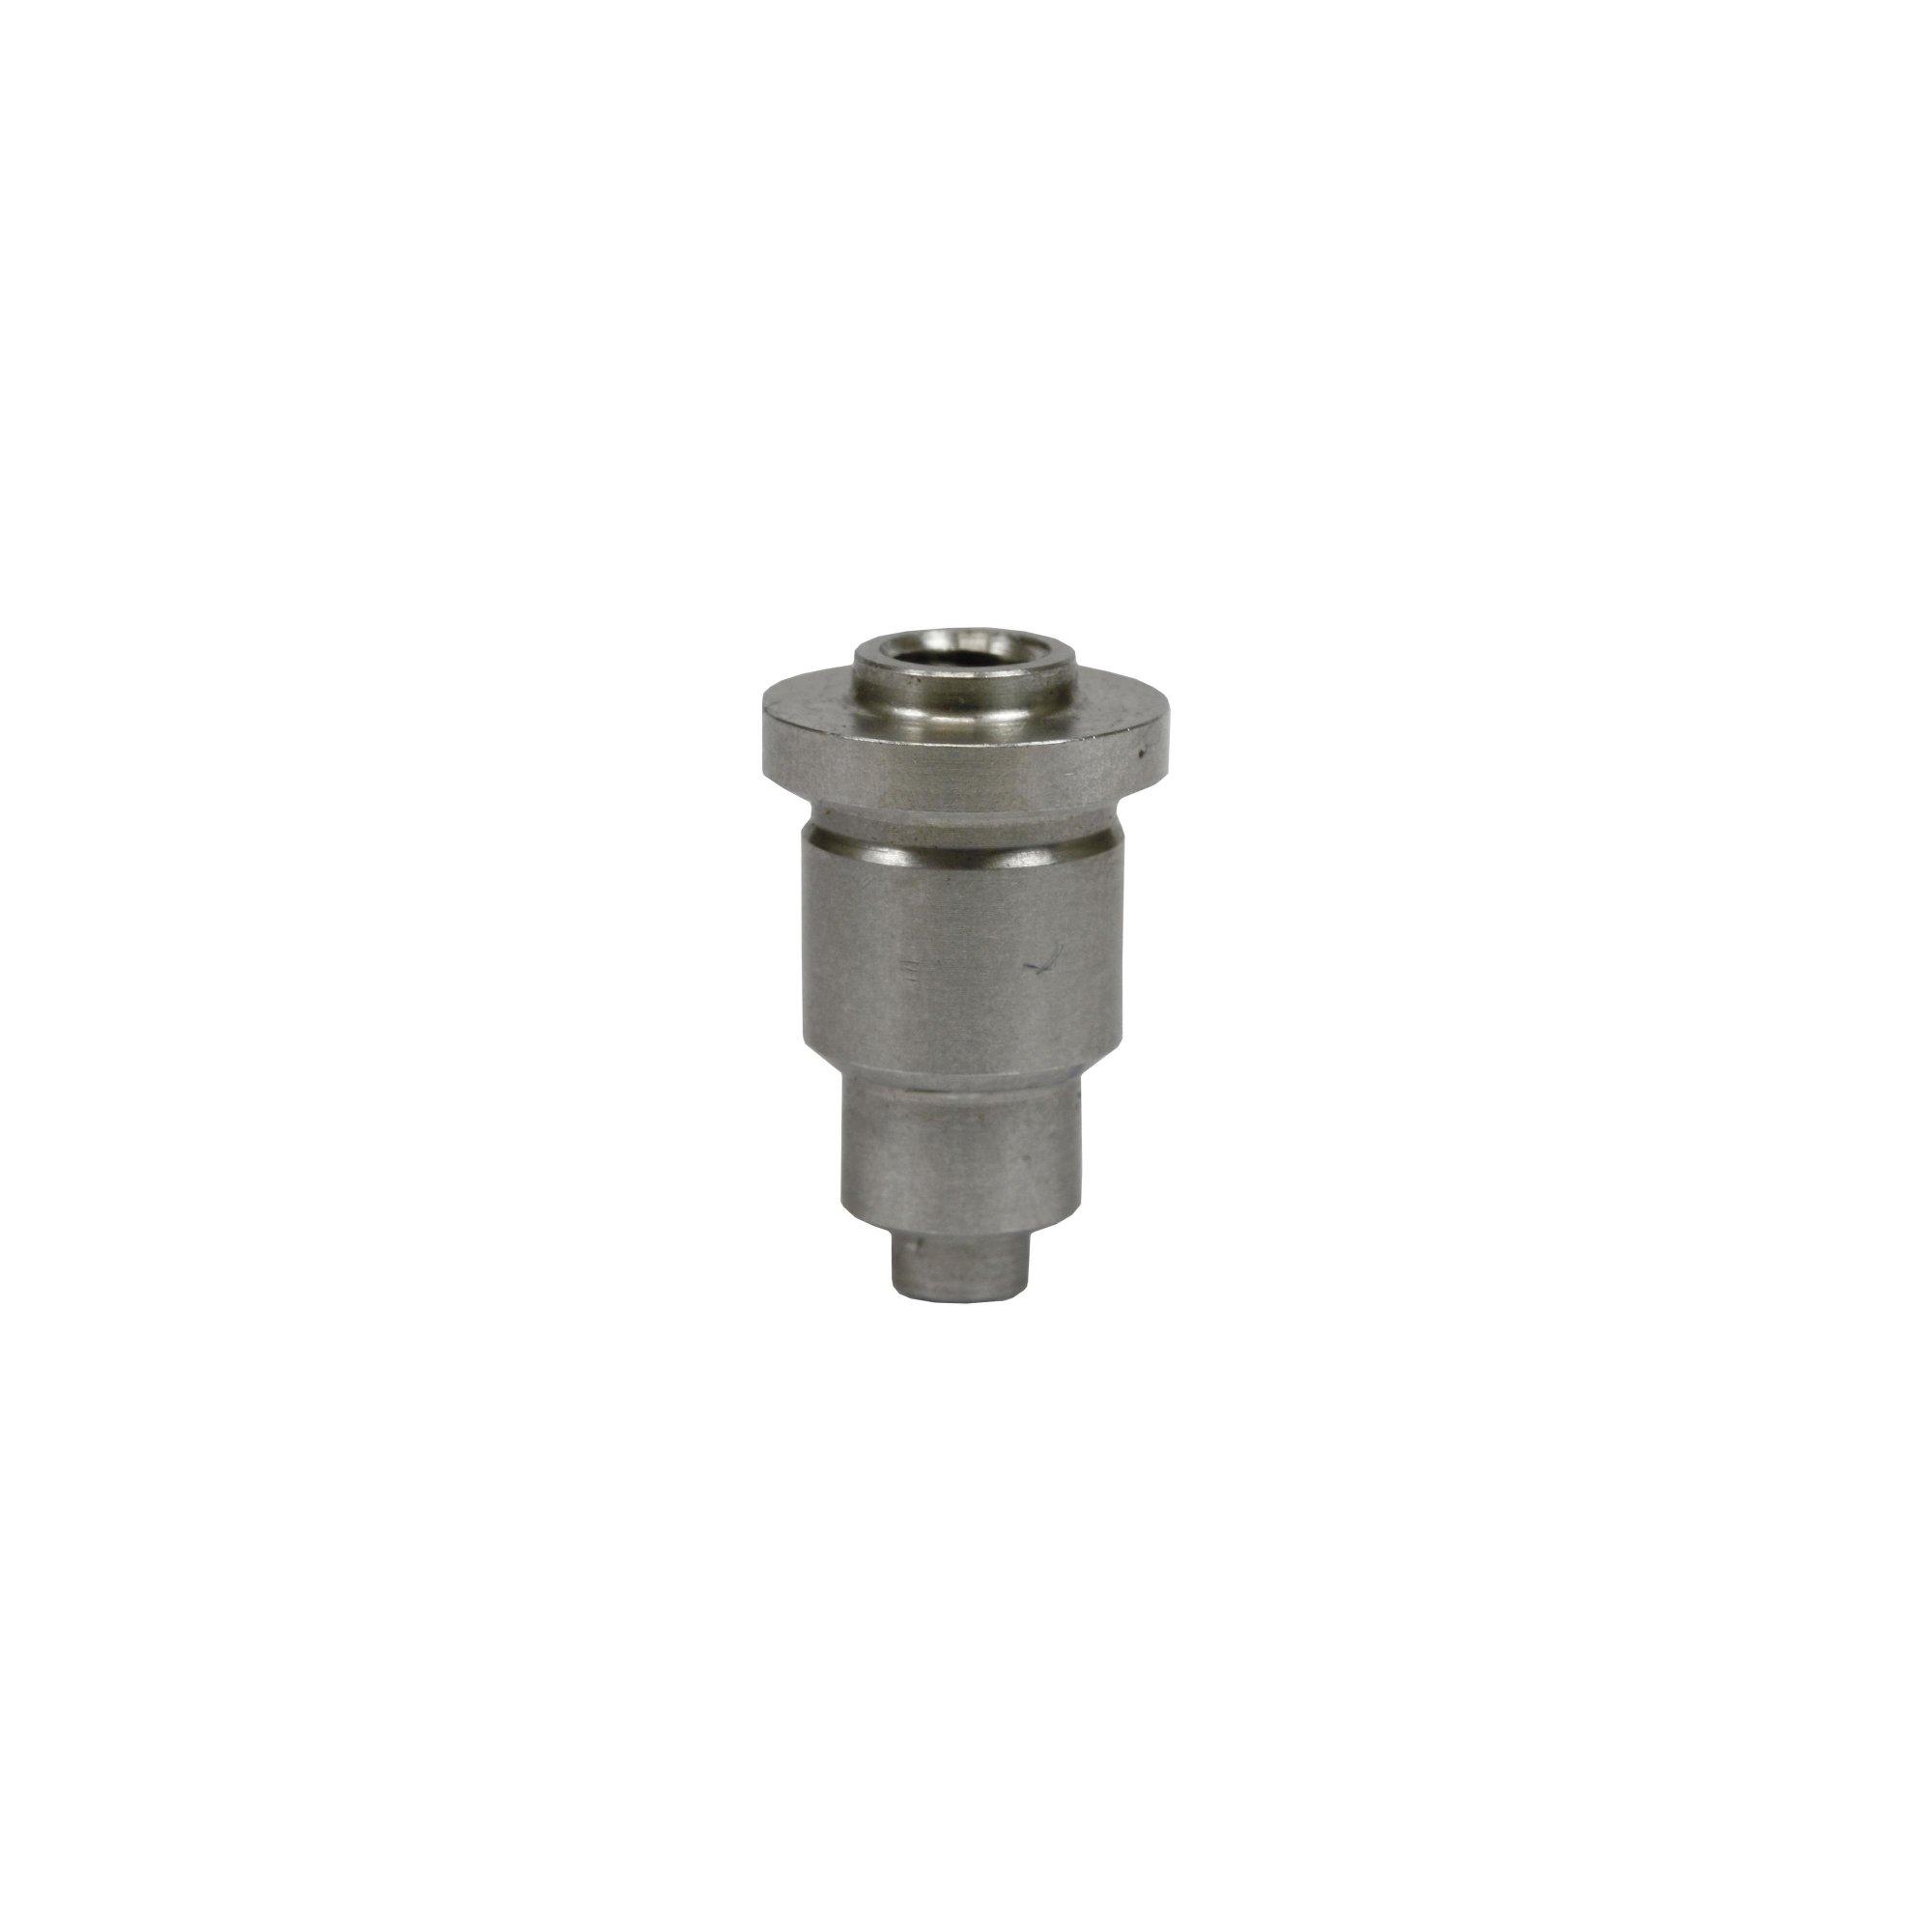 Suttner Injektordse 1,2 ST-16ff Steckbar | Injektordüse 1,2 ST-16ff Steckbar